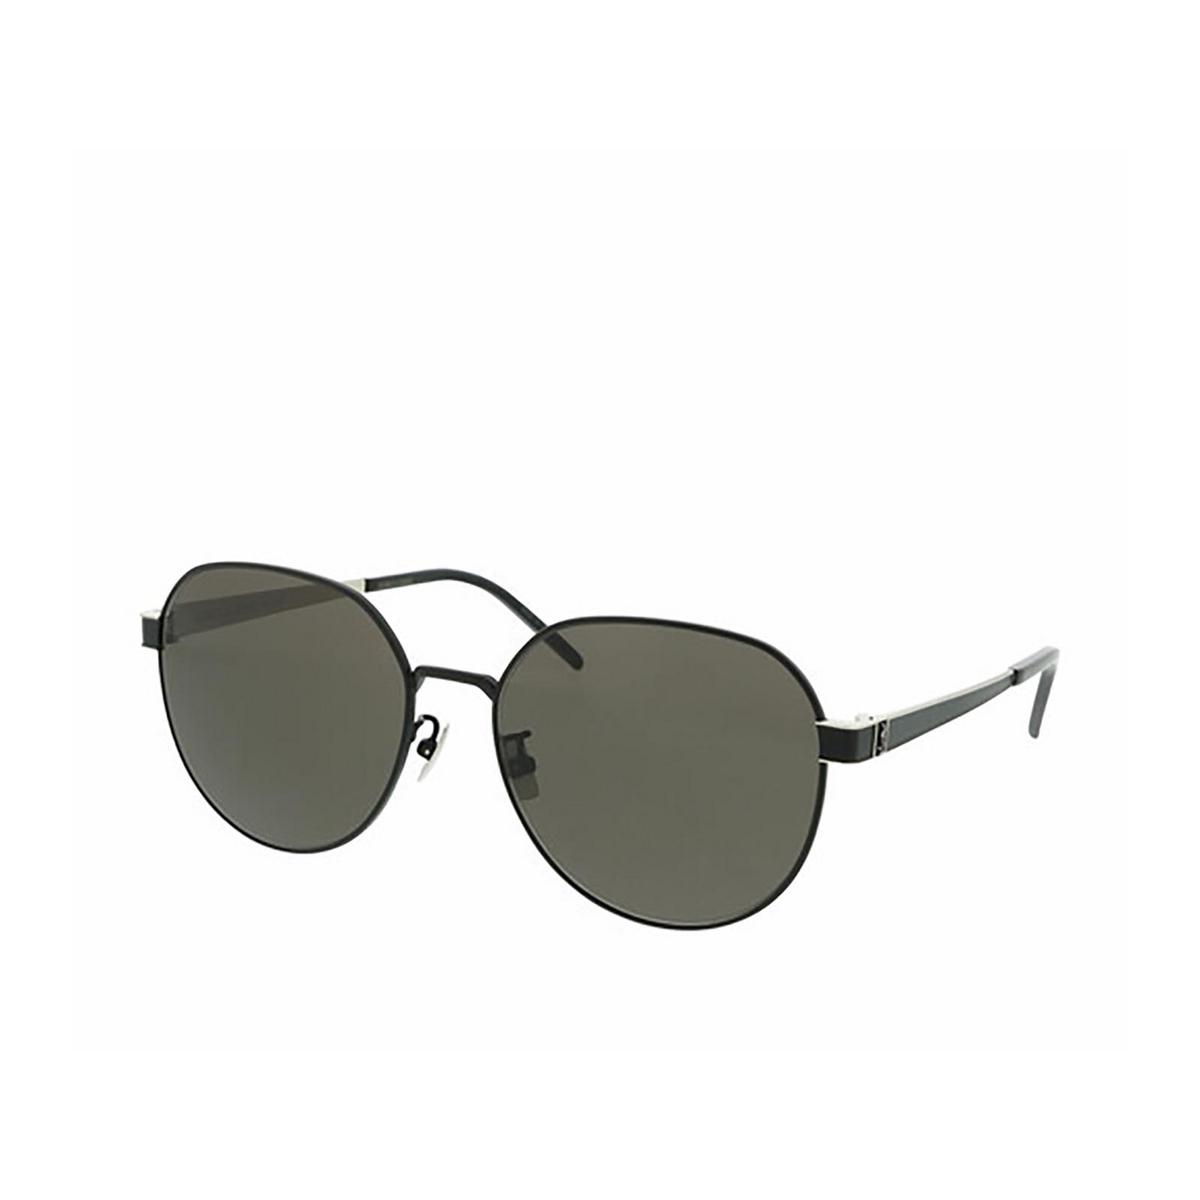 Saint Laurent® Round Sunglasses: SL M66 color Black 002 - three-quarters view.